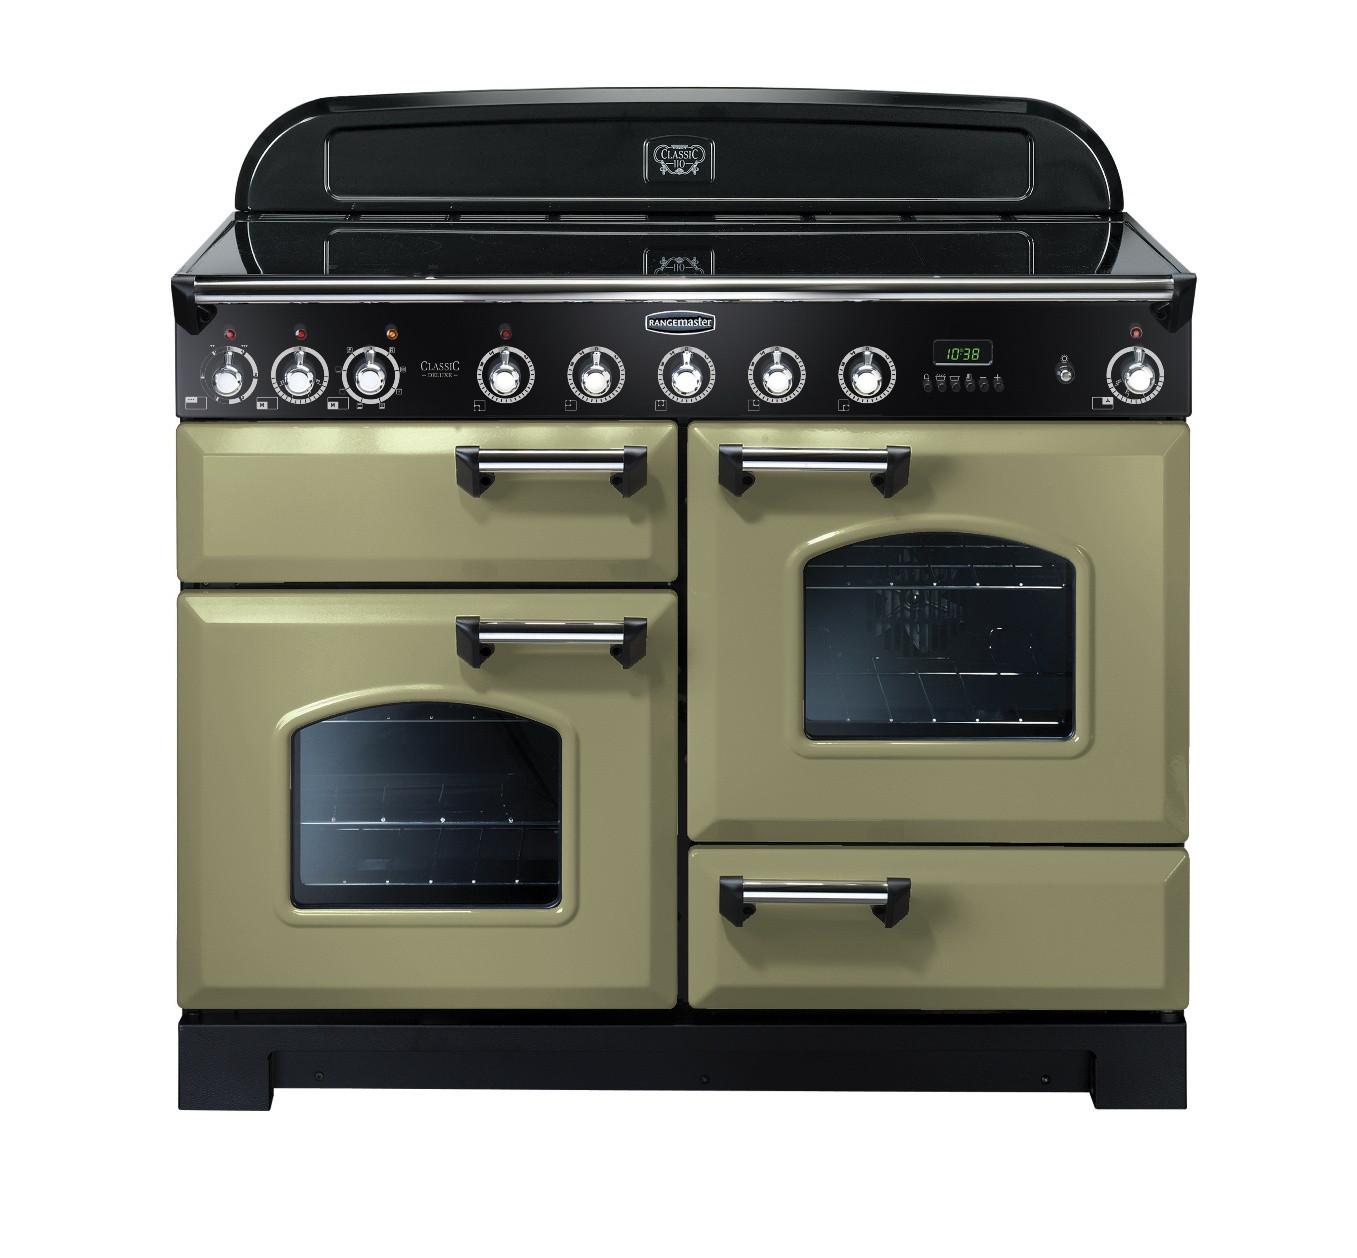 Rangemaster Classic Deluxe 110 Ceramic Range Cooker Olive Green/Chrome Trim CDL110ECOG/C 100940